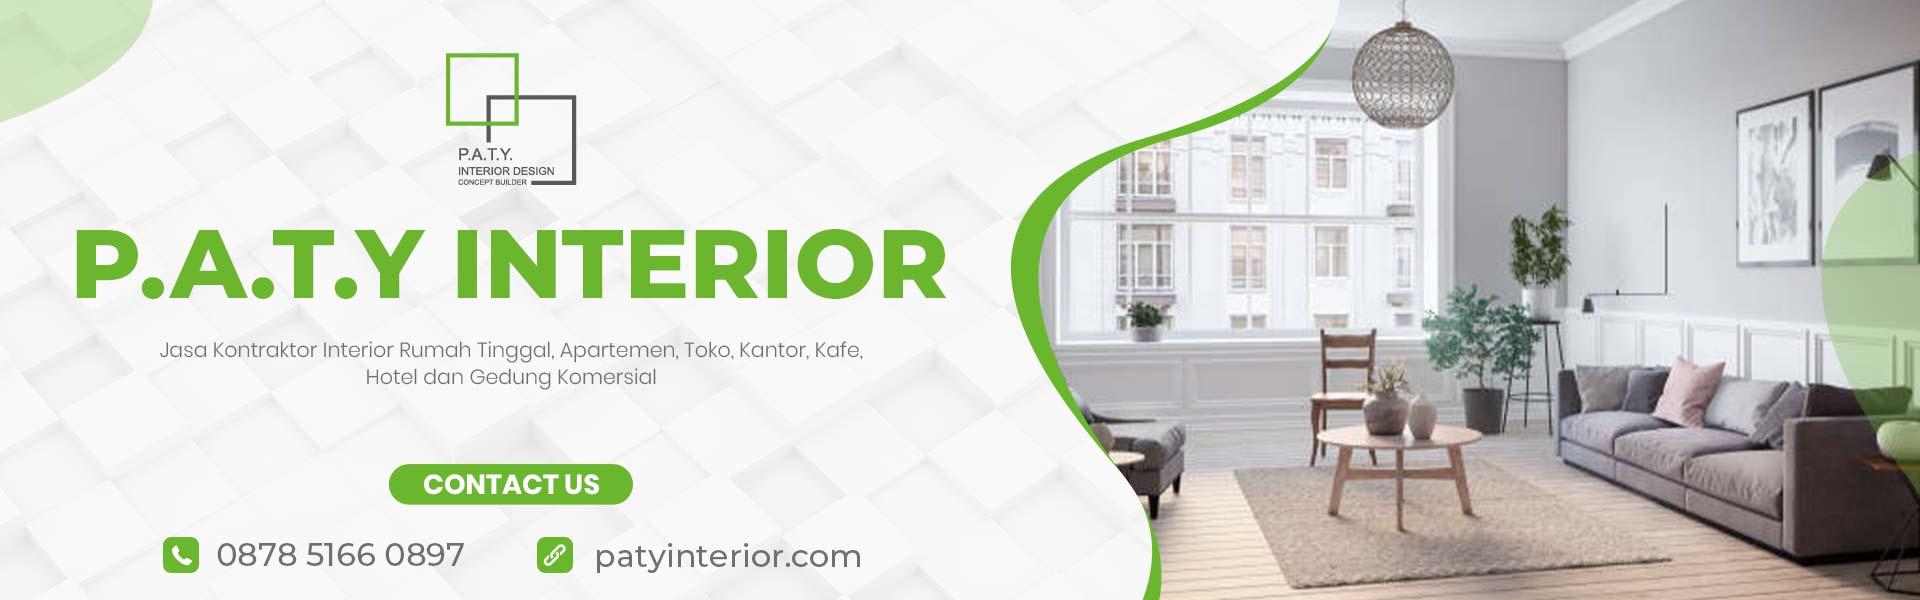 paty interior - jasa kontraktor interior rumah tinggal apartemen kantor toko kafe hotel dan gedung komersial